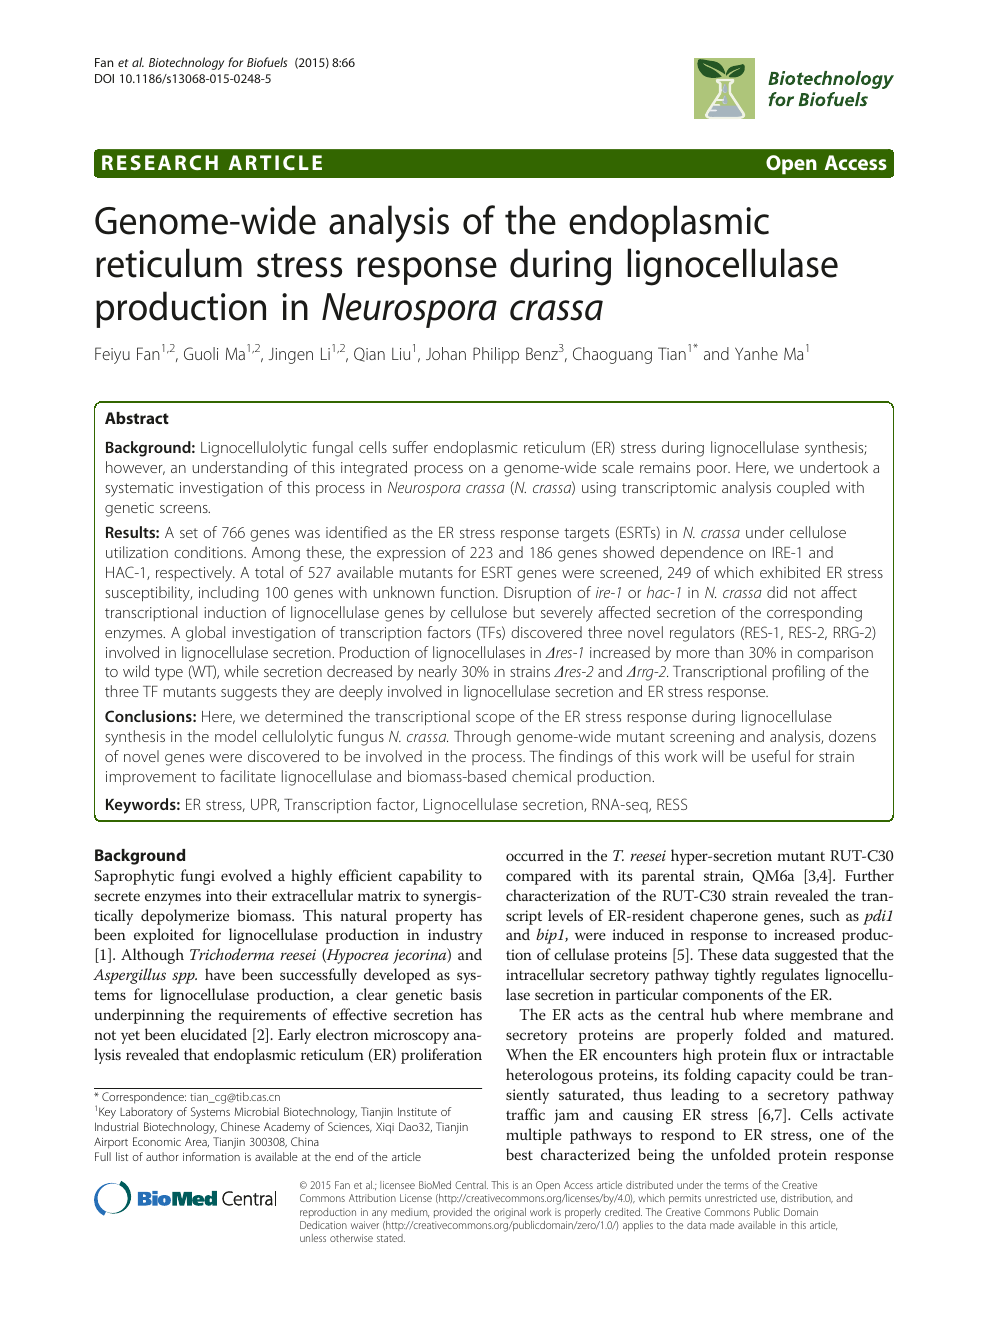 Genome-wide analysis of the endoplasmic reticulum stress